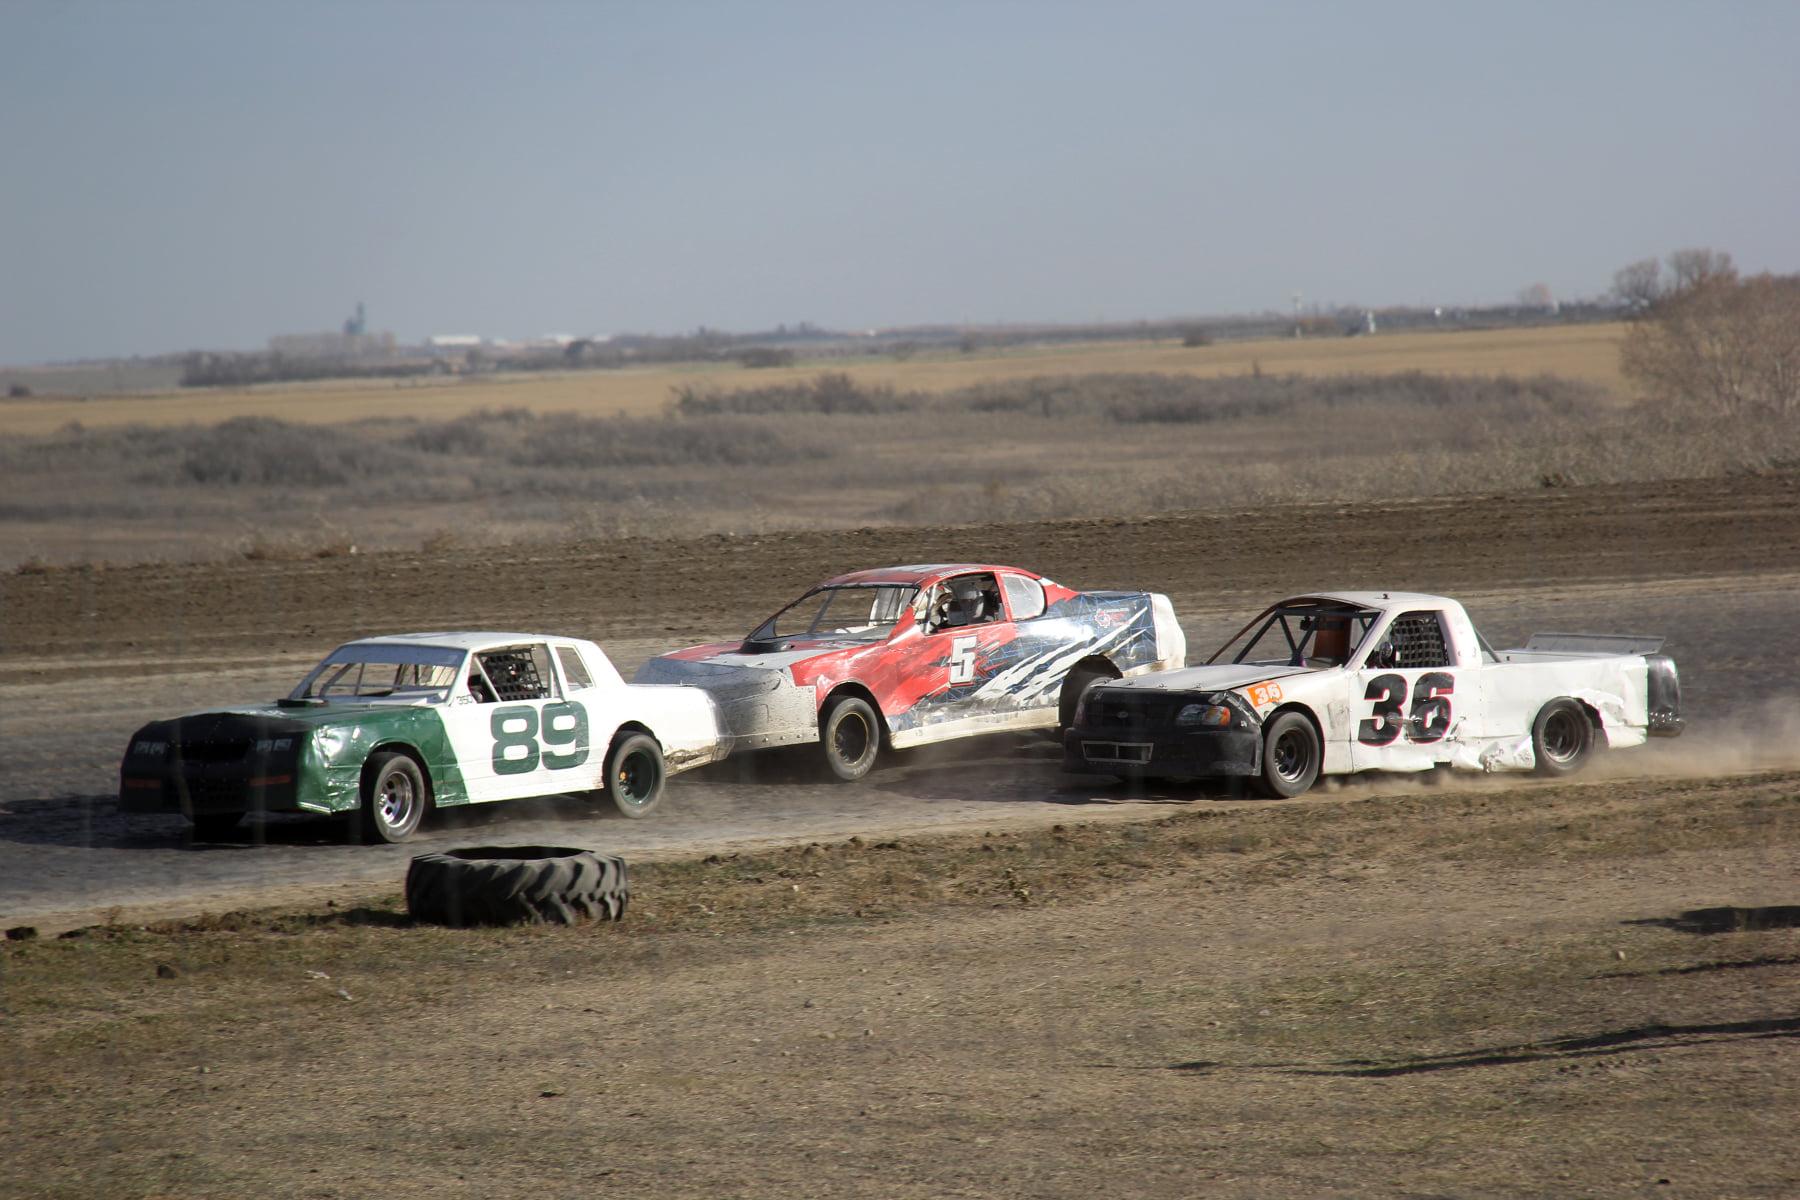 Outlook_Racing_Kemmer_Racing_Photography_22.jpg